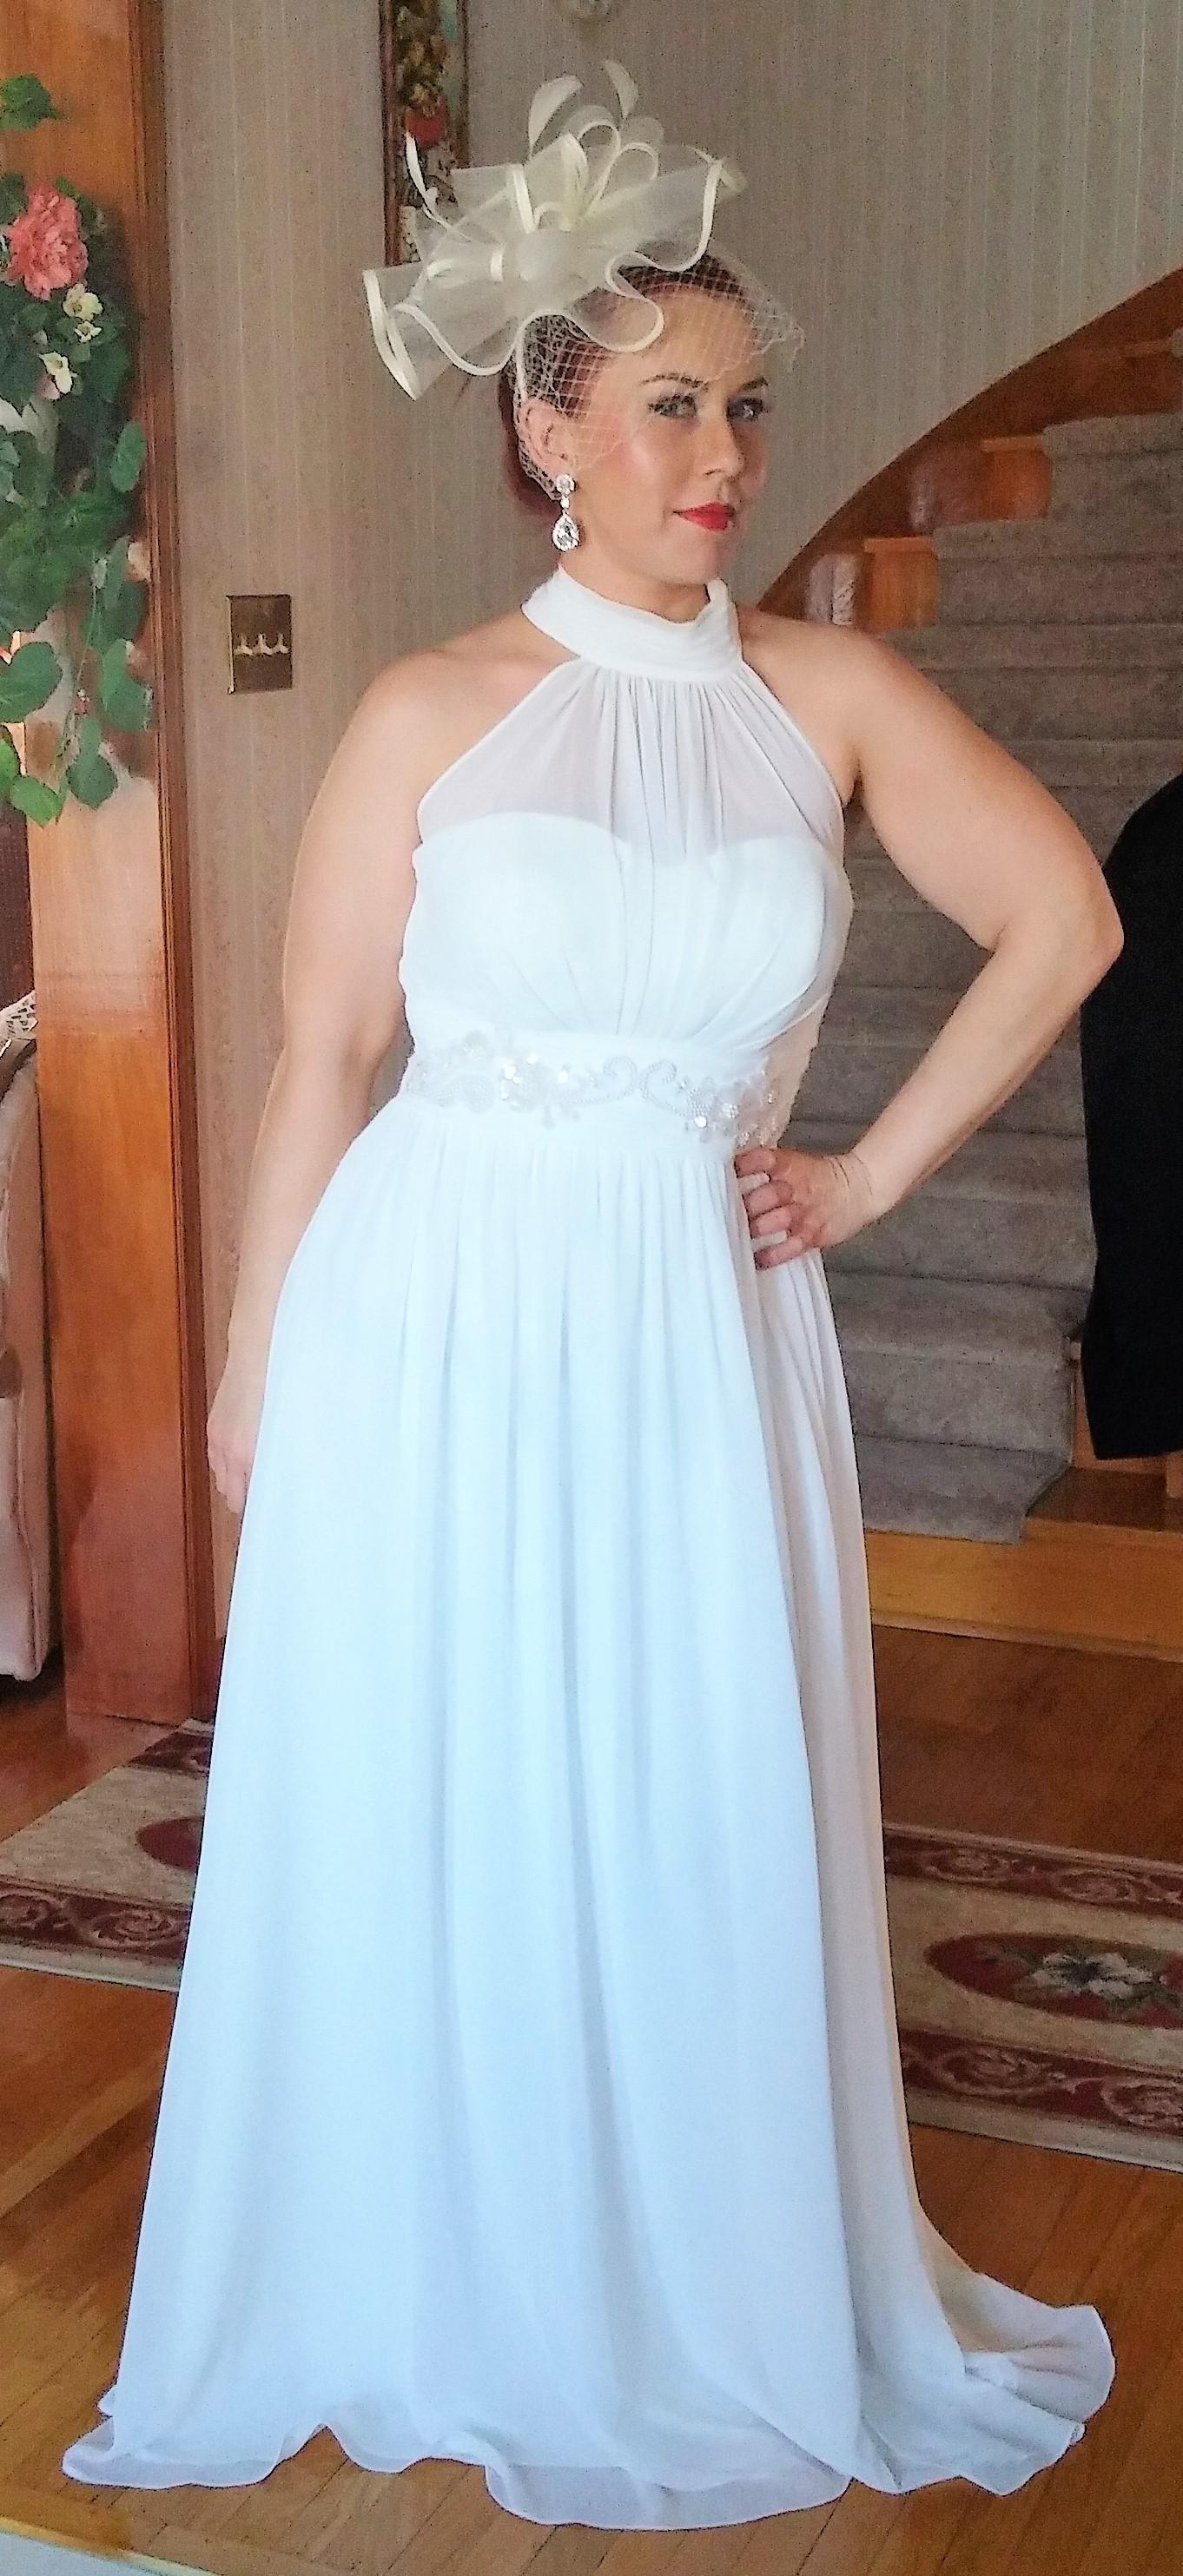 Azazie Iman Bridesmaid Dress | Azazie - photo #33